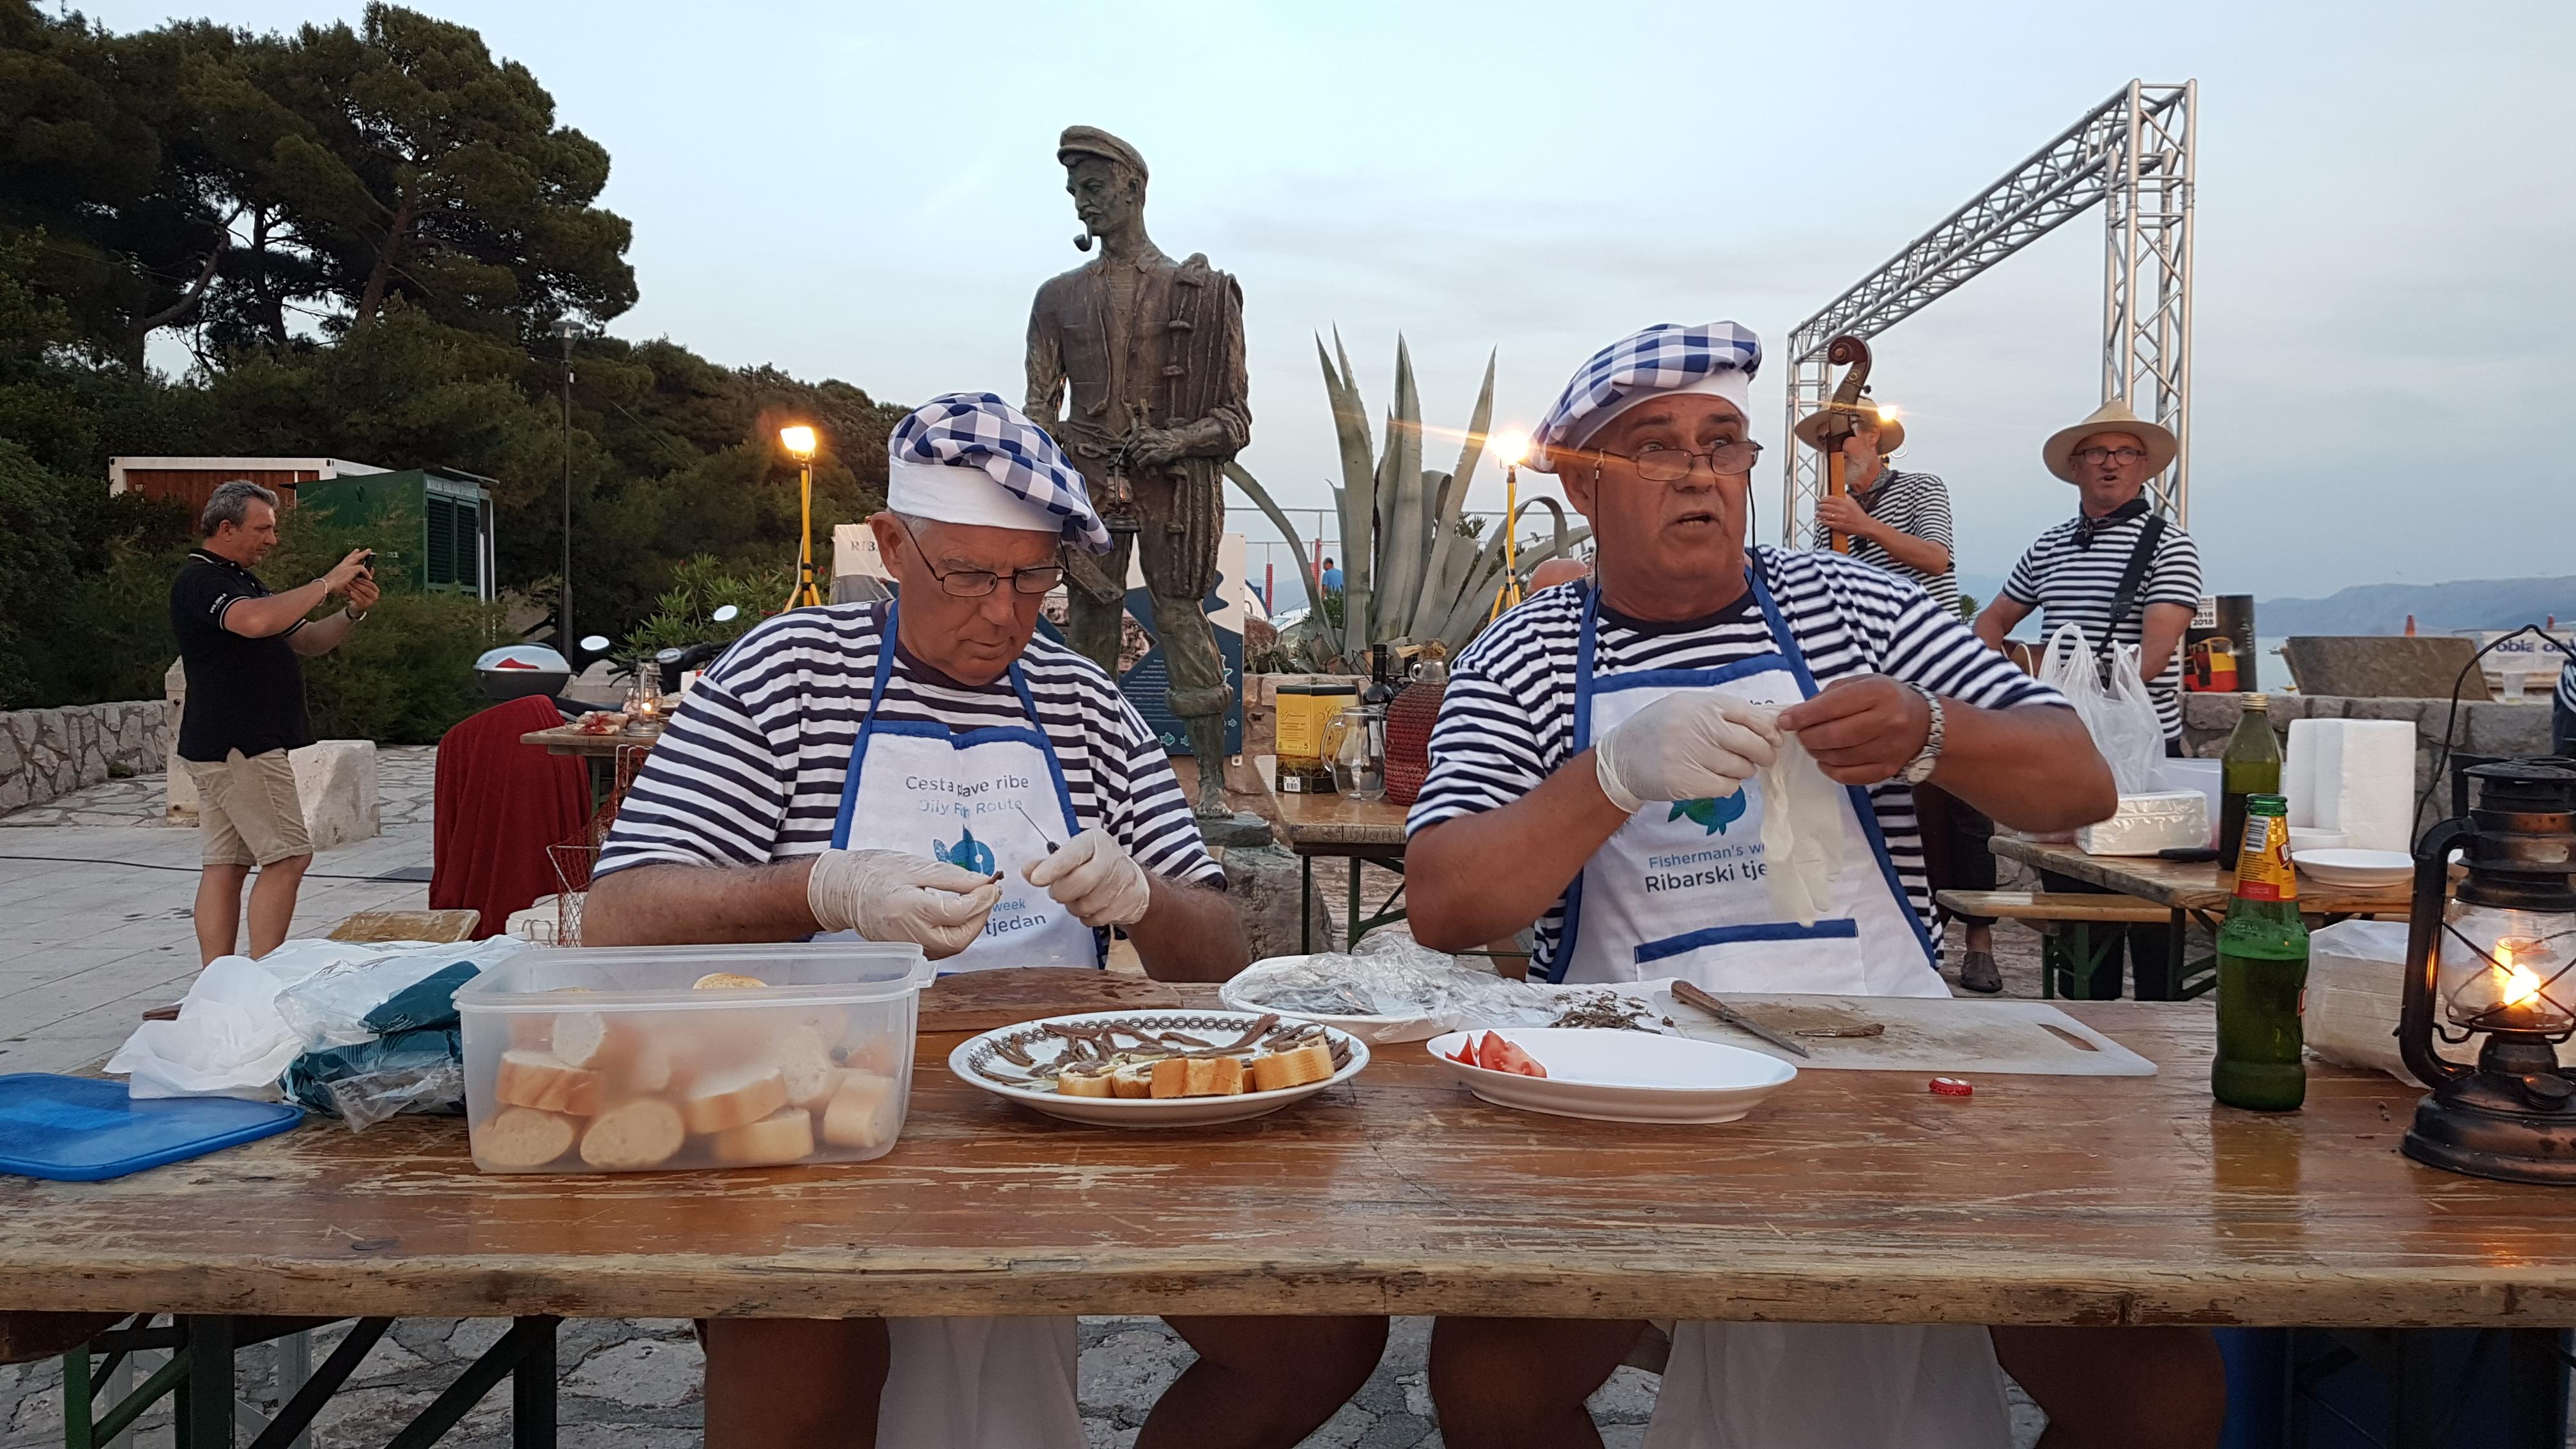 Članovi PŠRD Arbun pripremali su ukusne delicije / Snimila Nataša CAR